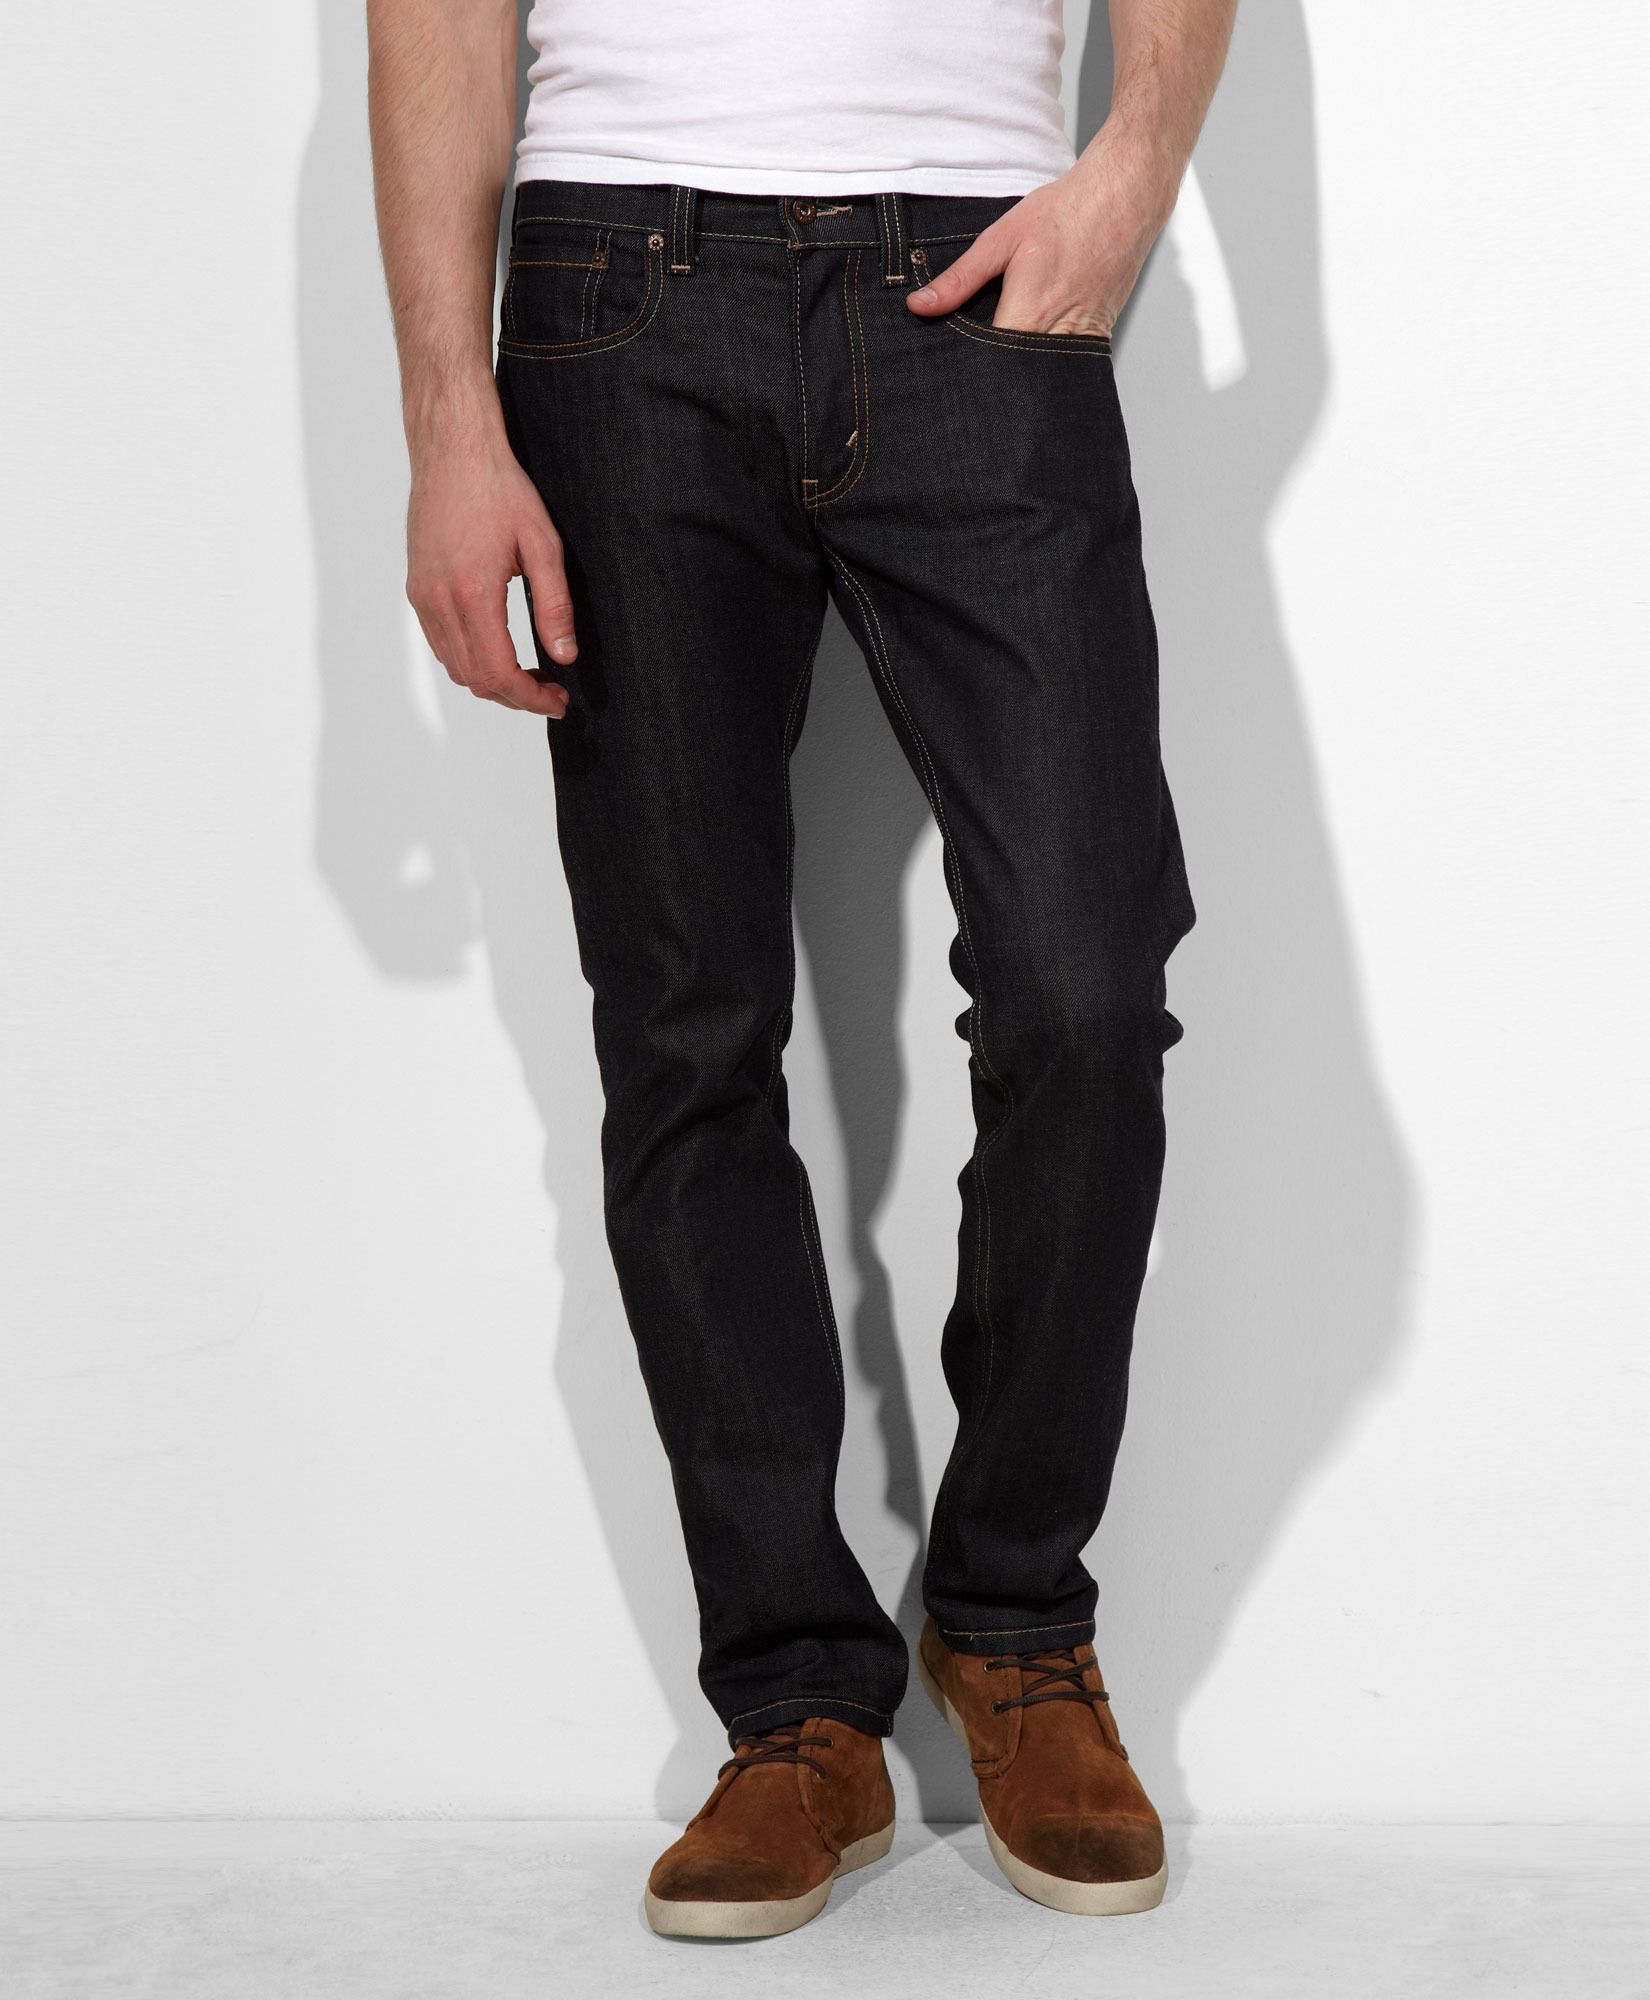 6da0b499 511™ Slim Fit Stretch Jeans | men's fashion | Slim jeans, Jeans ...